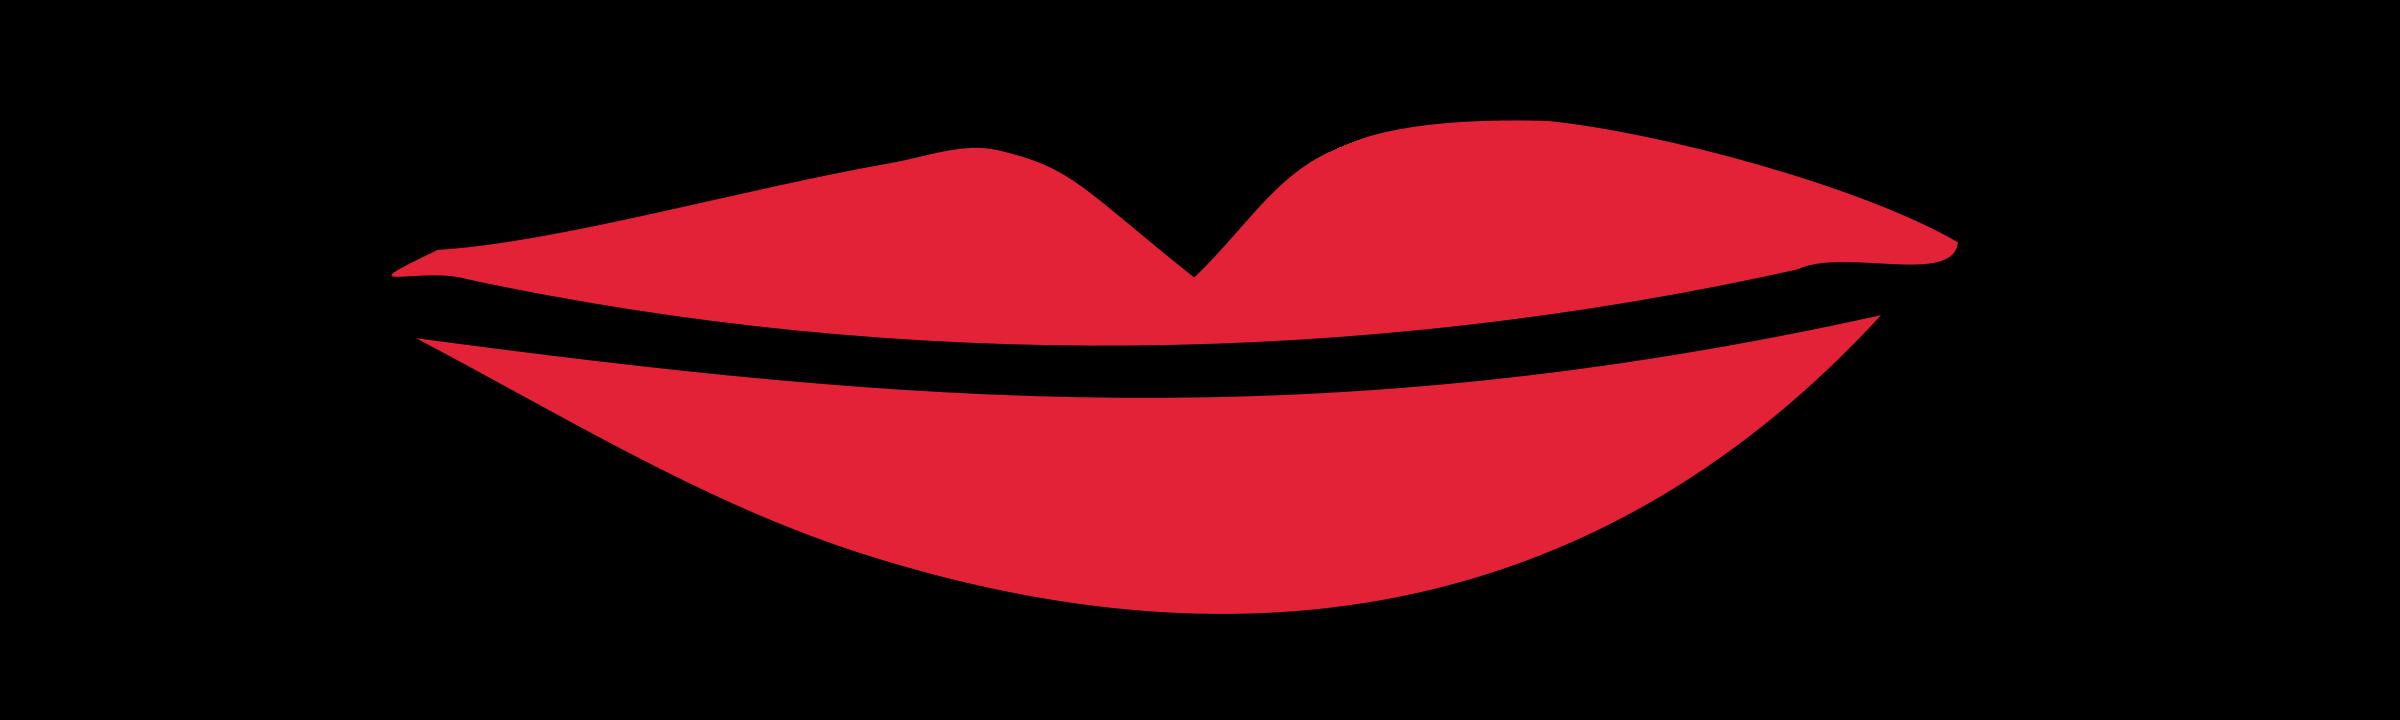 Art mouth kendra